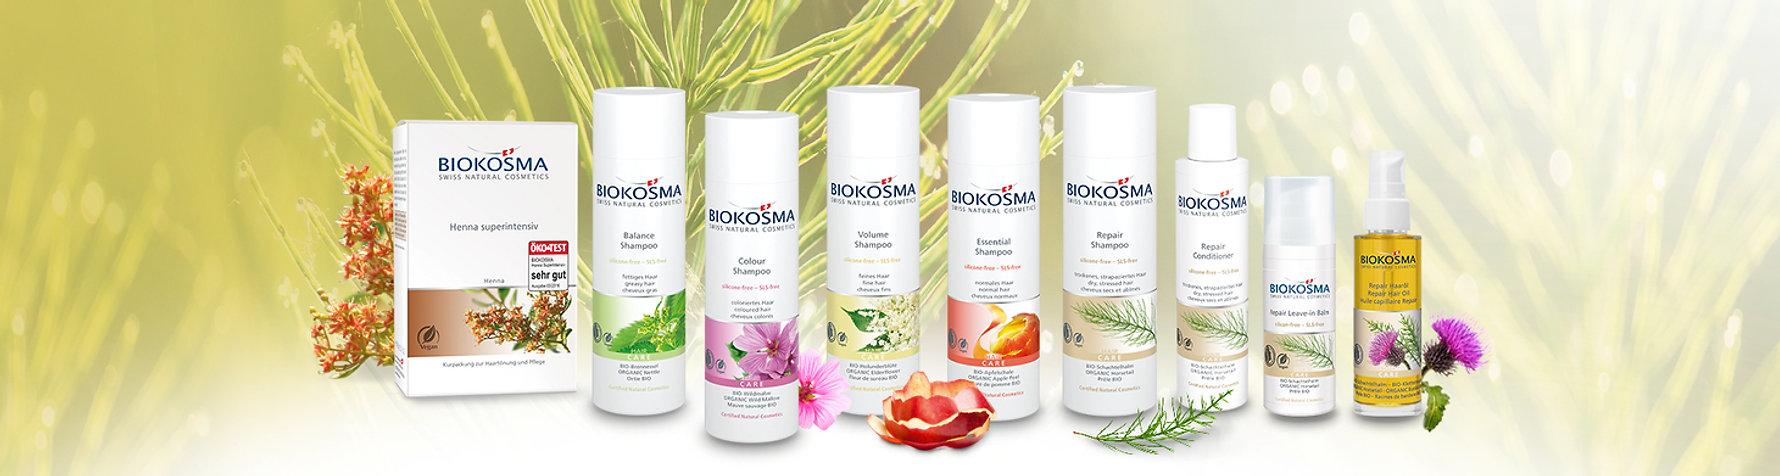 Biokosma_Titelbild-Kategorie_Hair-Care_2